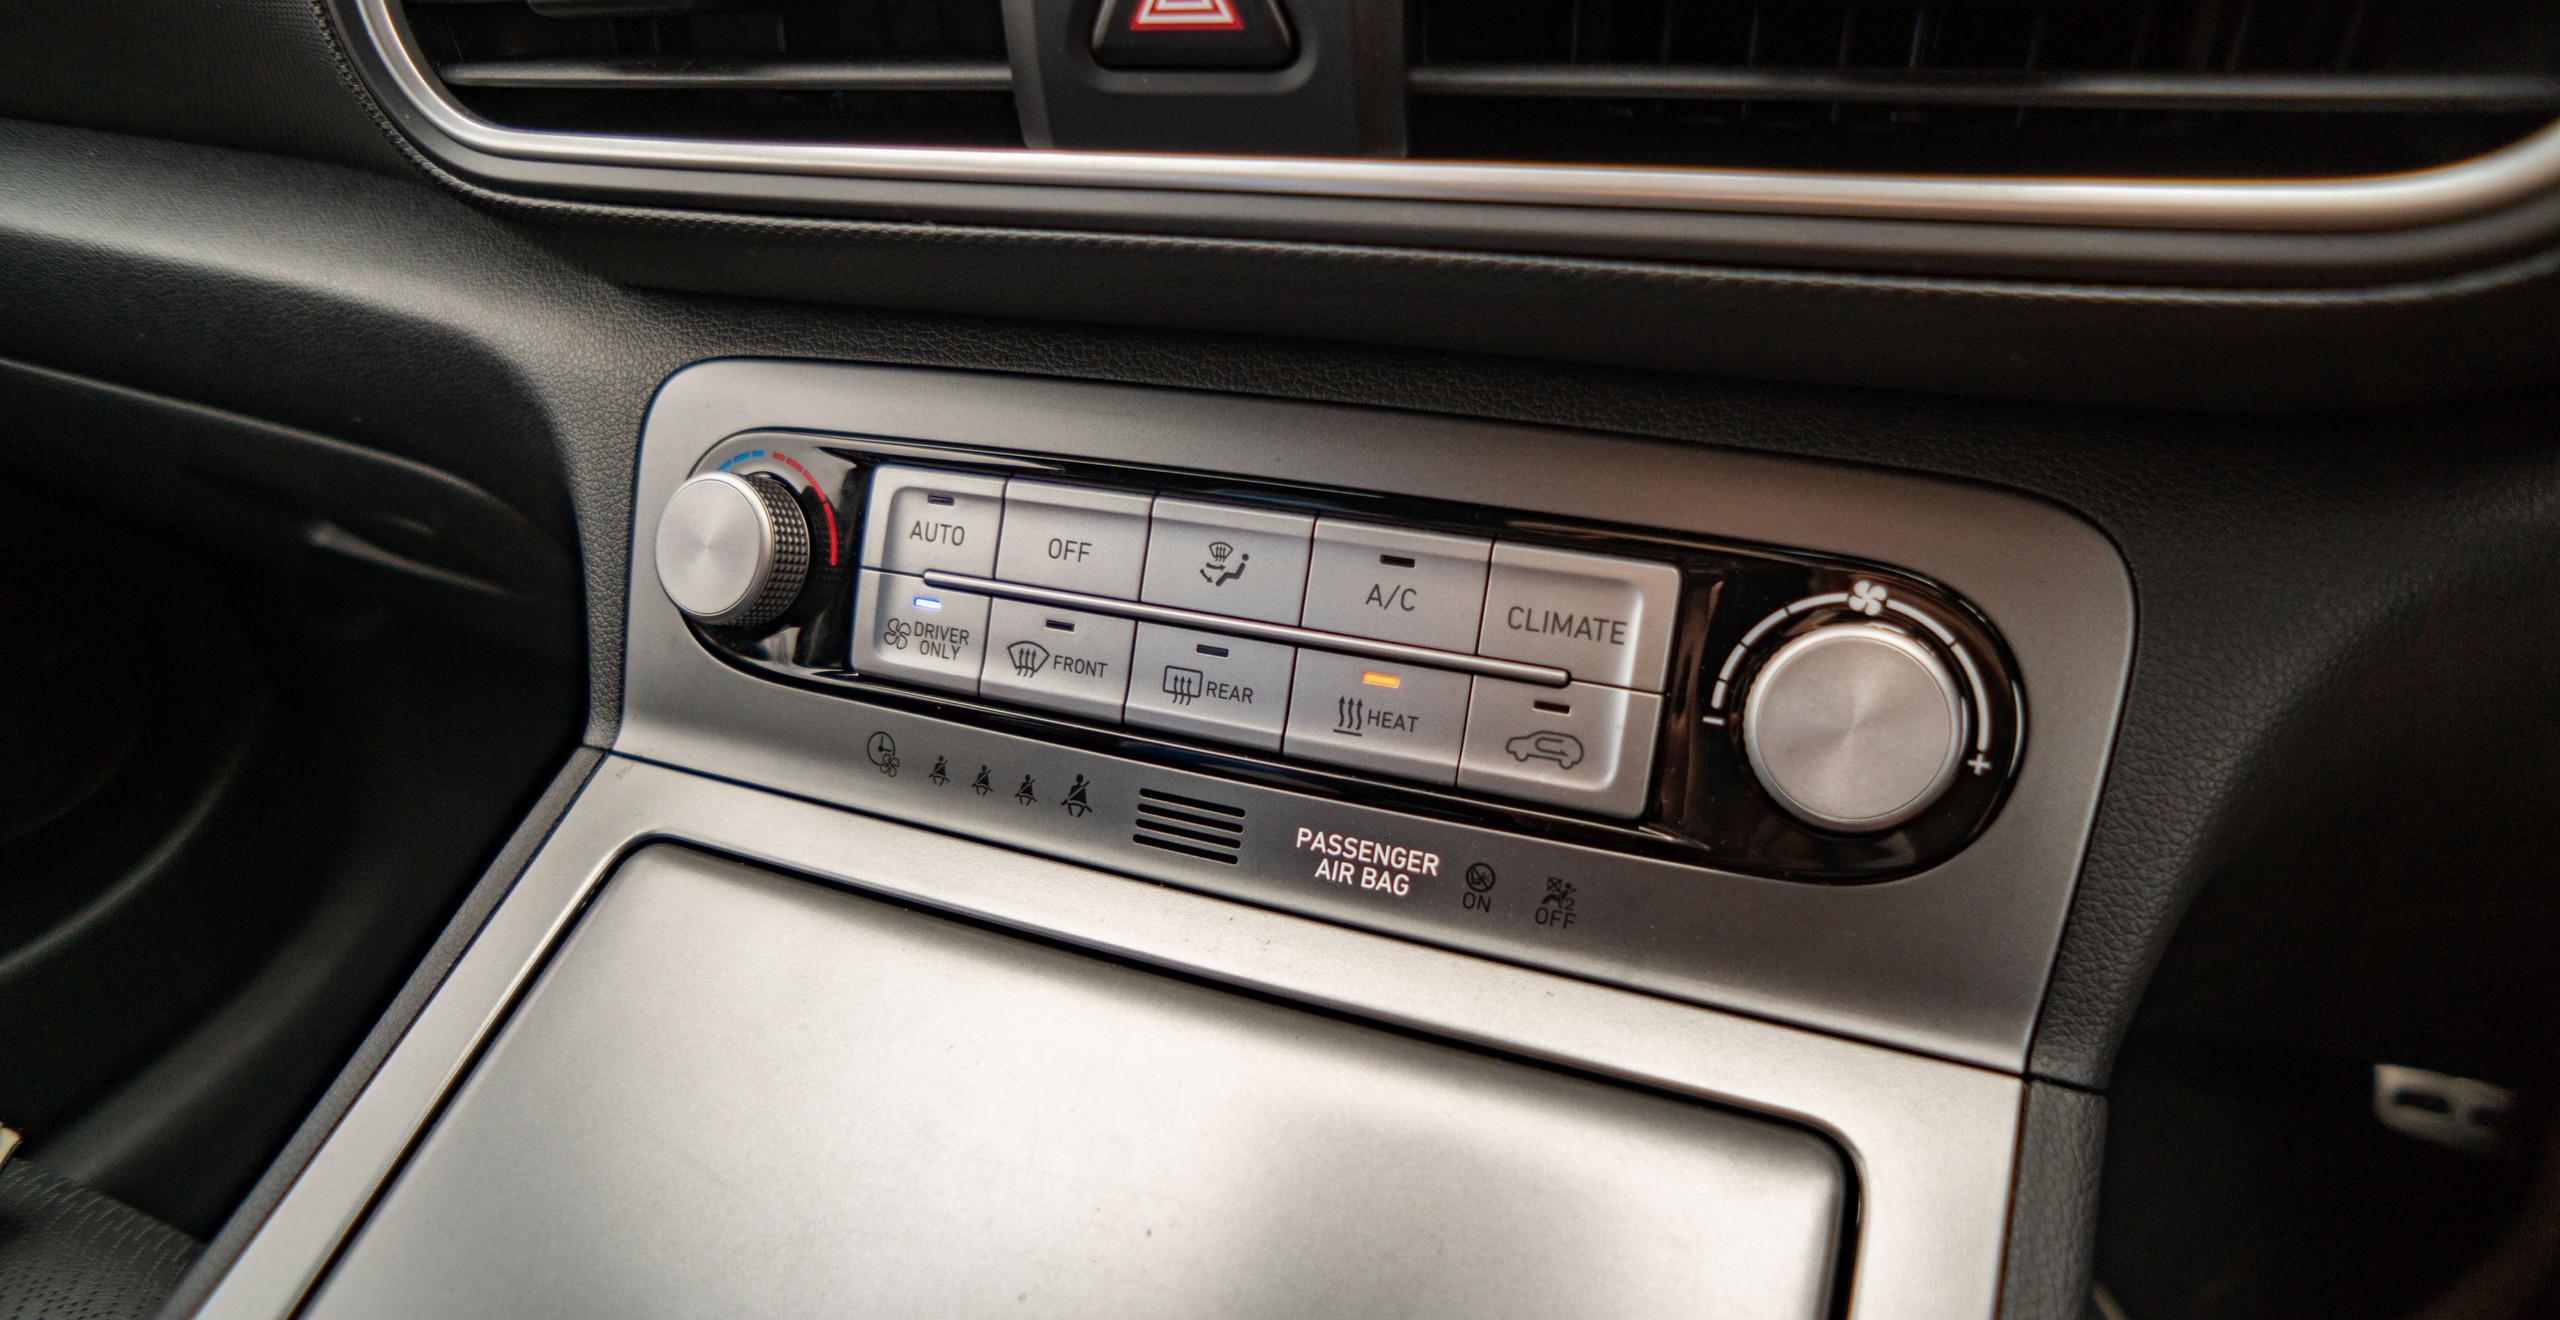 Hyundai Kona Electric 2019 interior climate controls